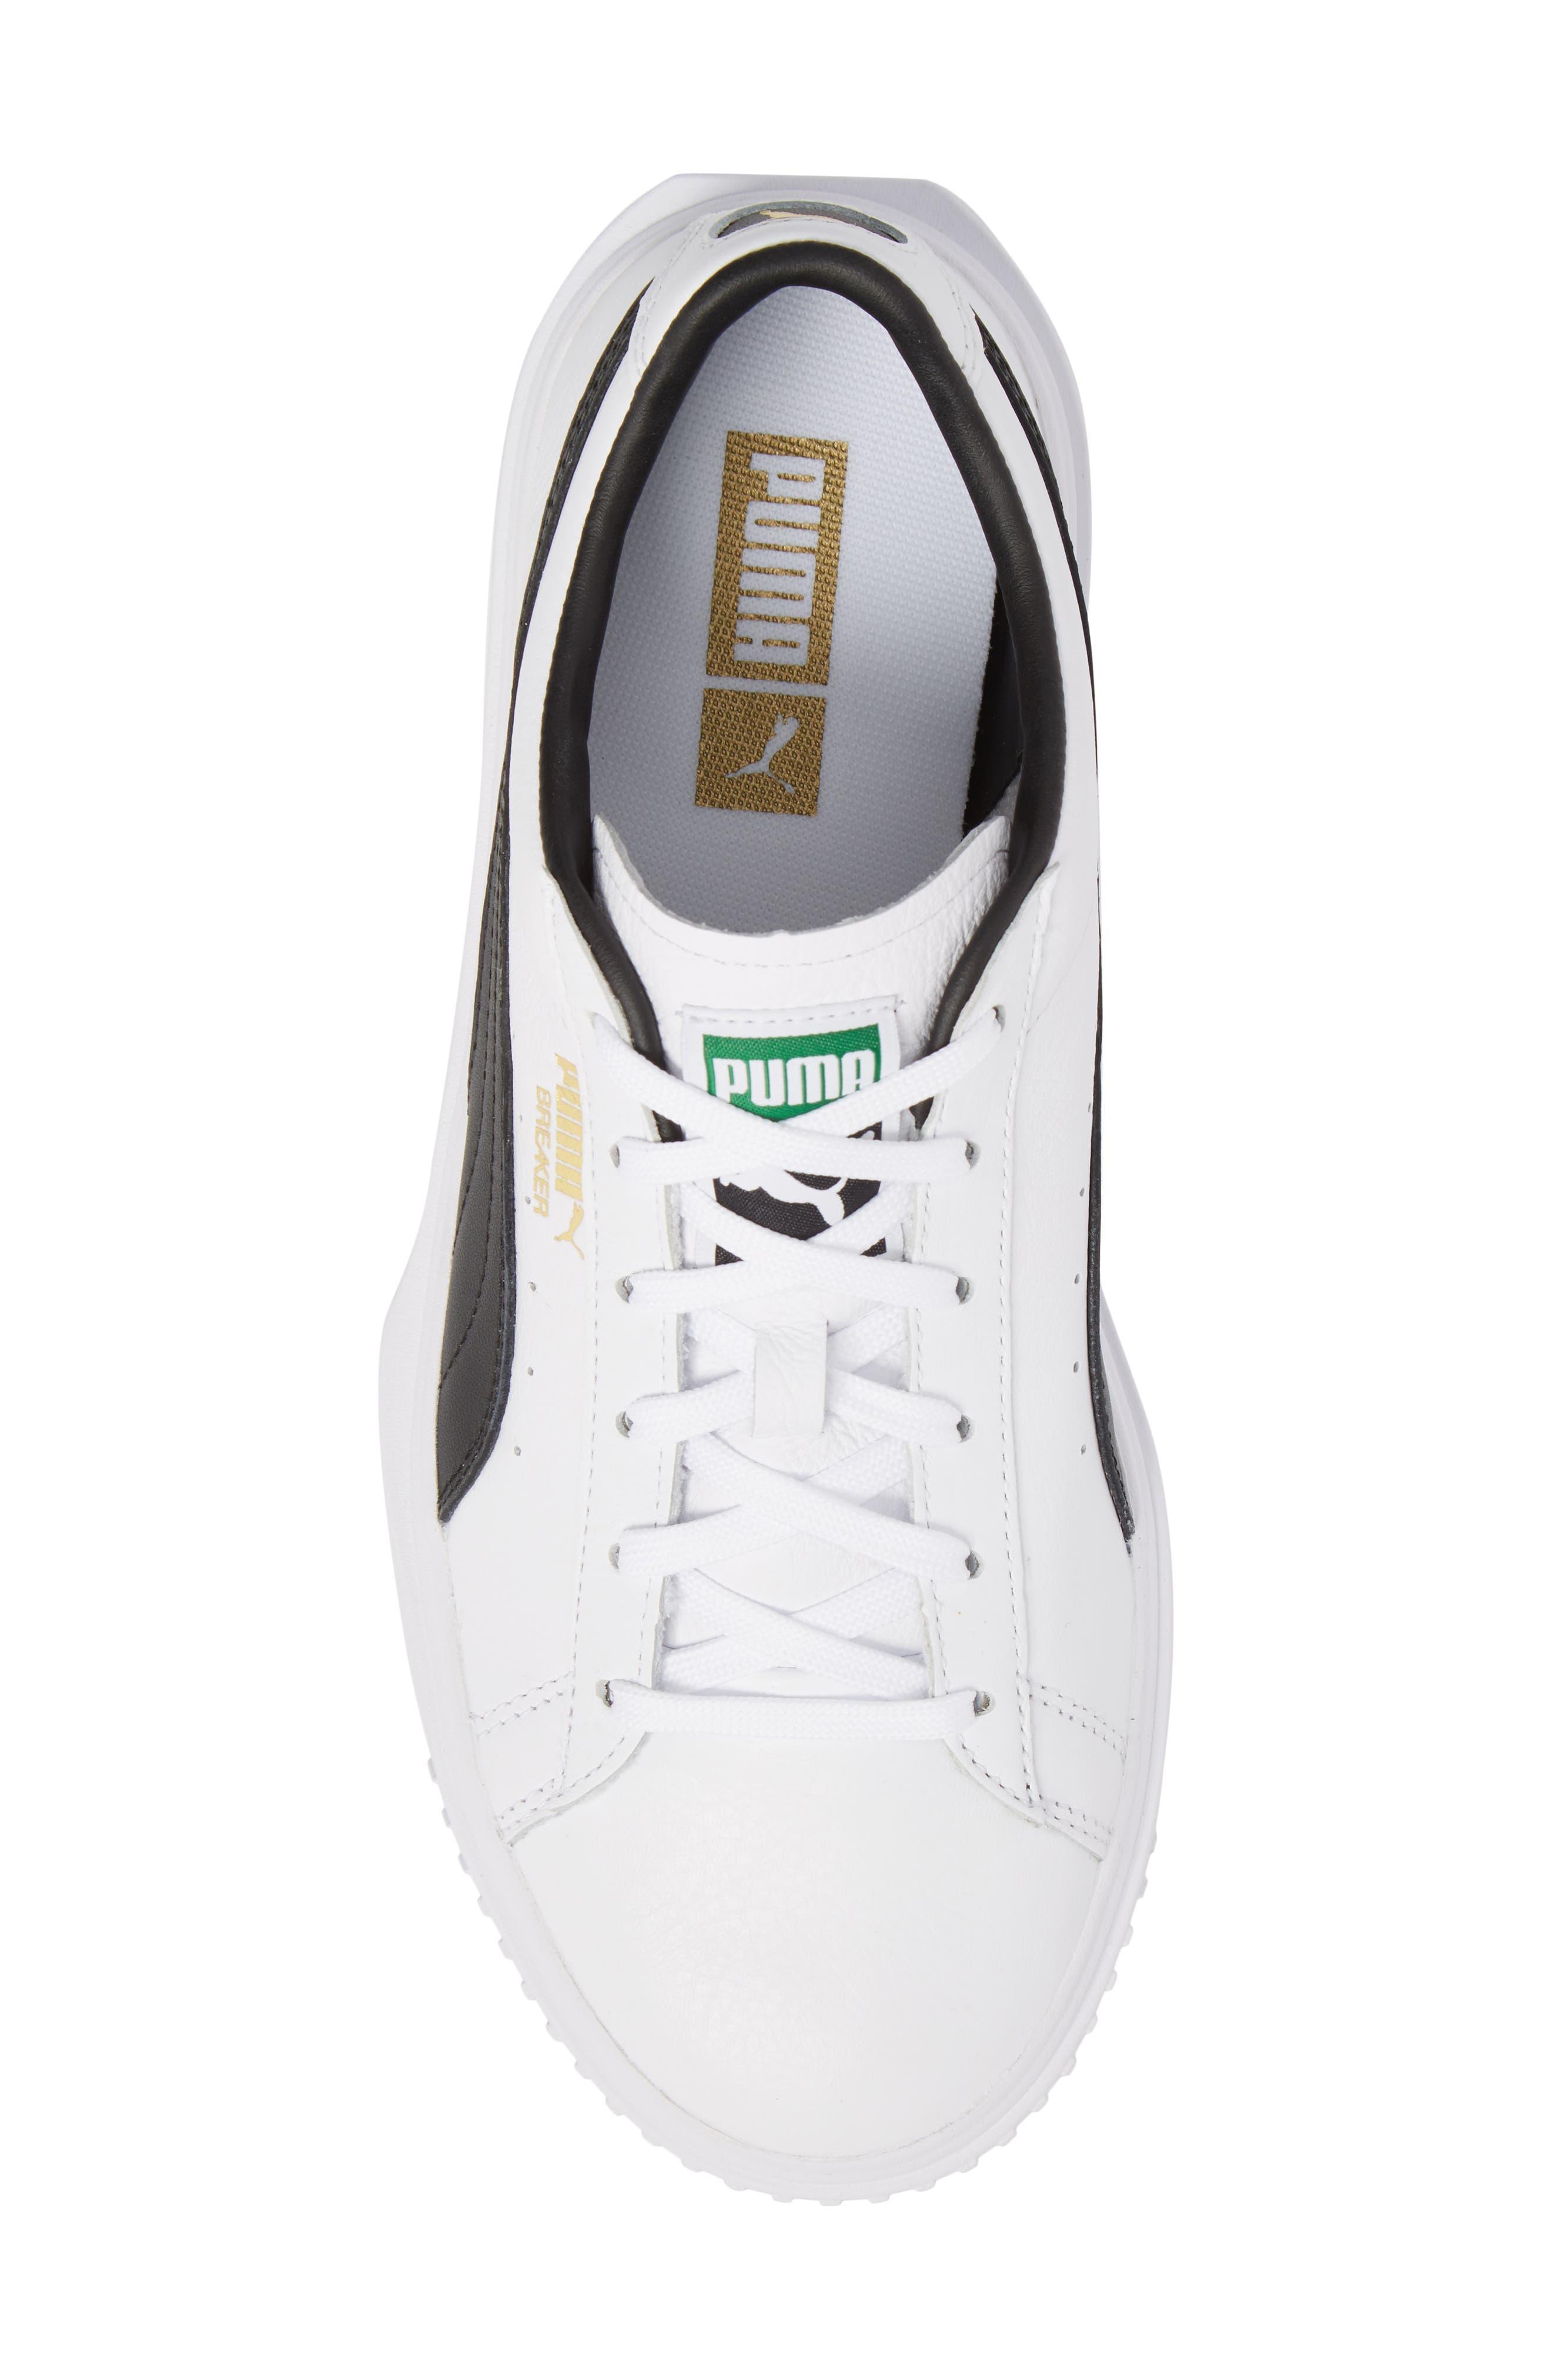 Breaker Low Top Sneaker,                             Alternate thumbnail 5, color,                             White/ Black Leather